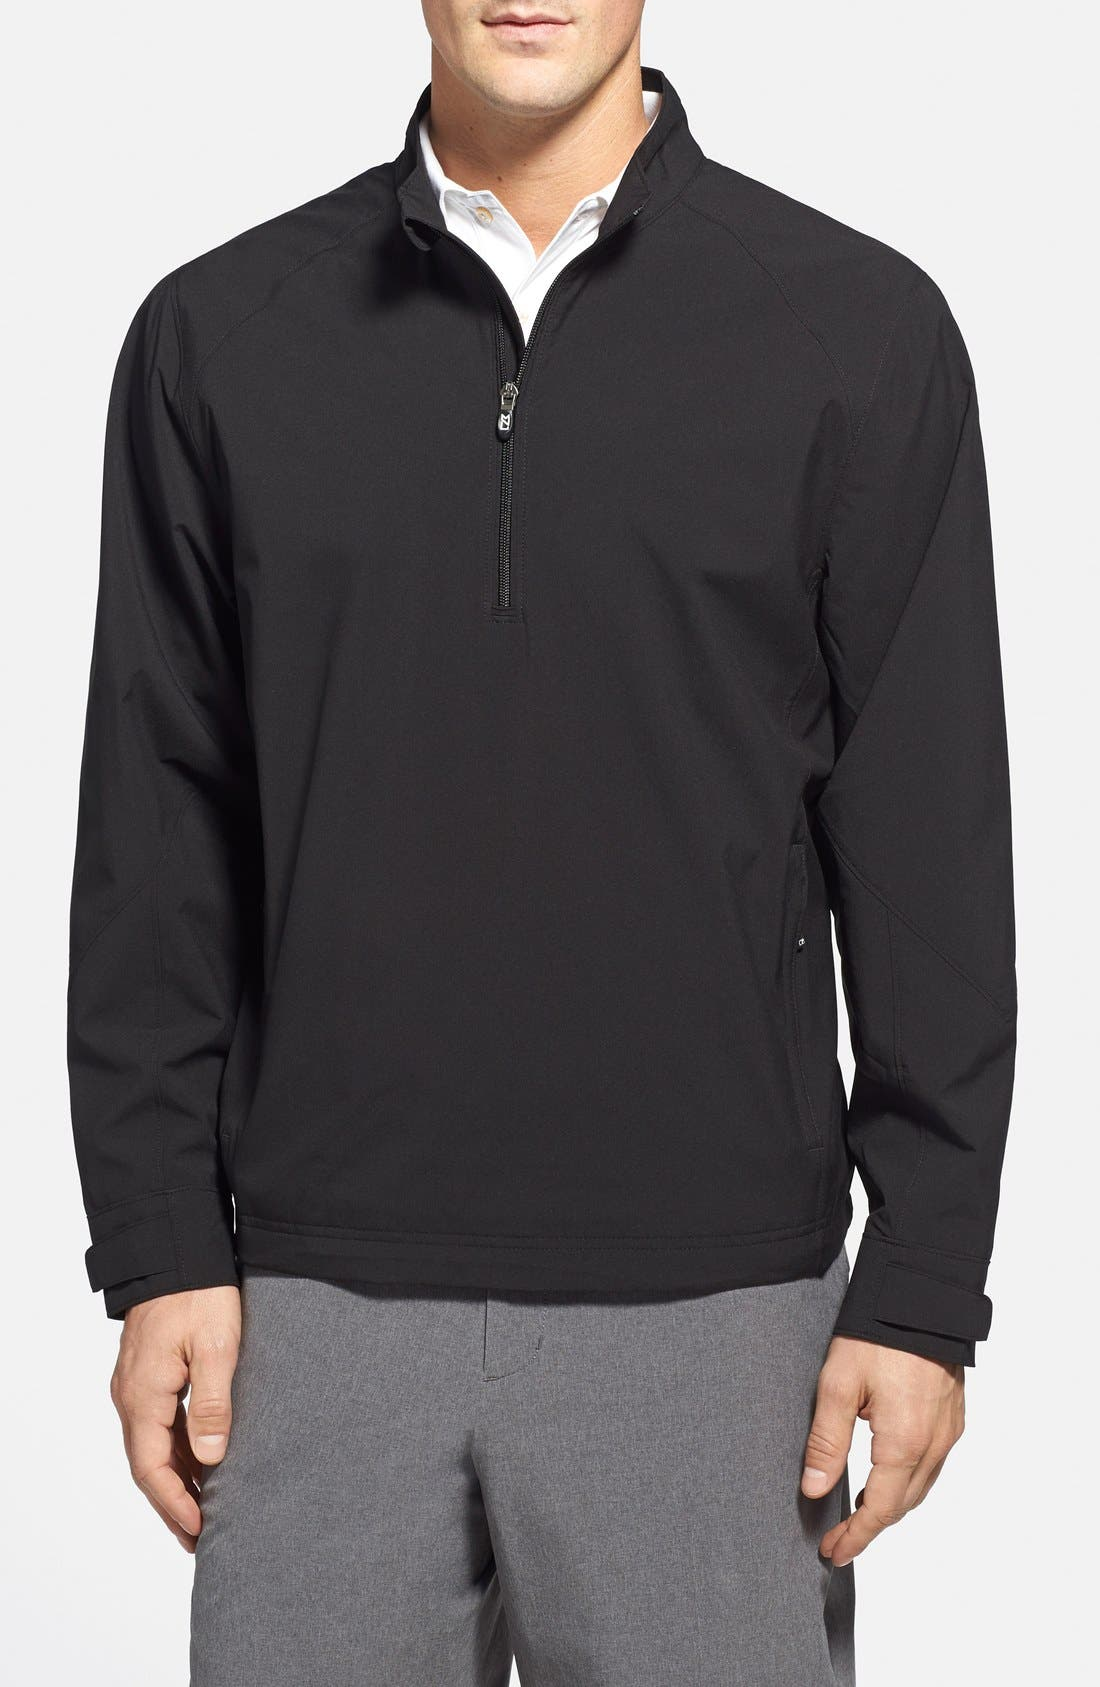 'Summit' WeatherTec Wind & Water Resistant Half Zip Jacket,                             Main thumbnail 1, color,                             Black